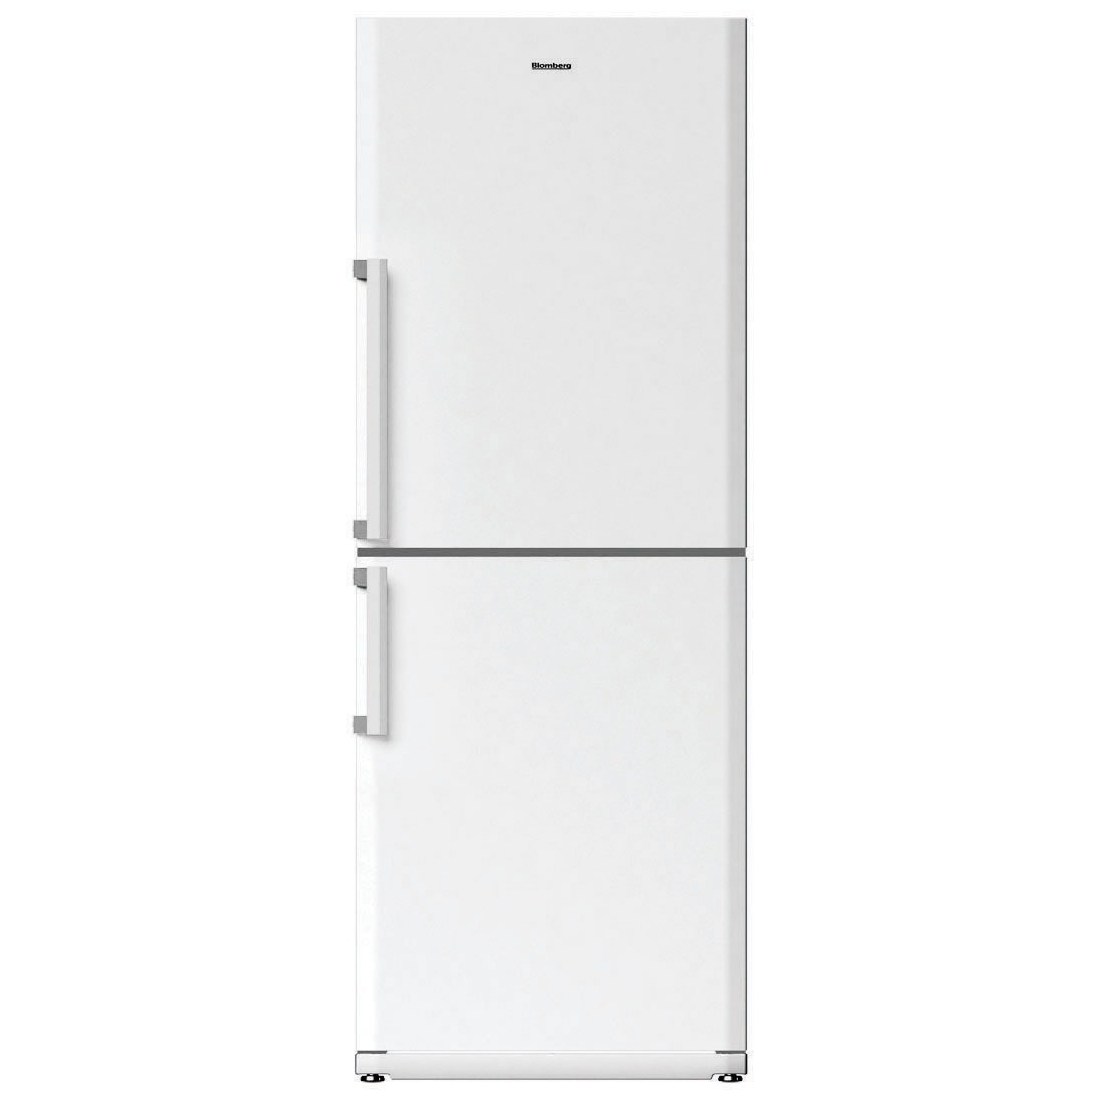 kgm9691 blomberg frost free fridge freezer